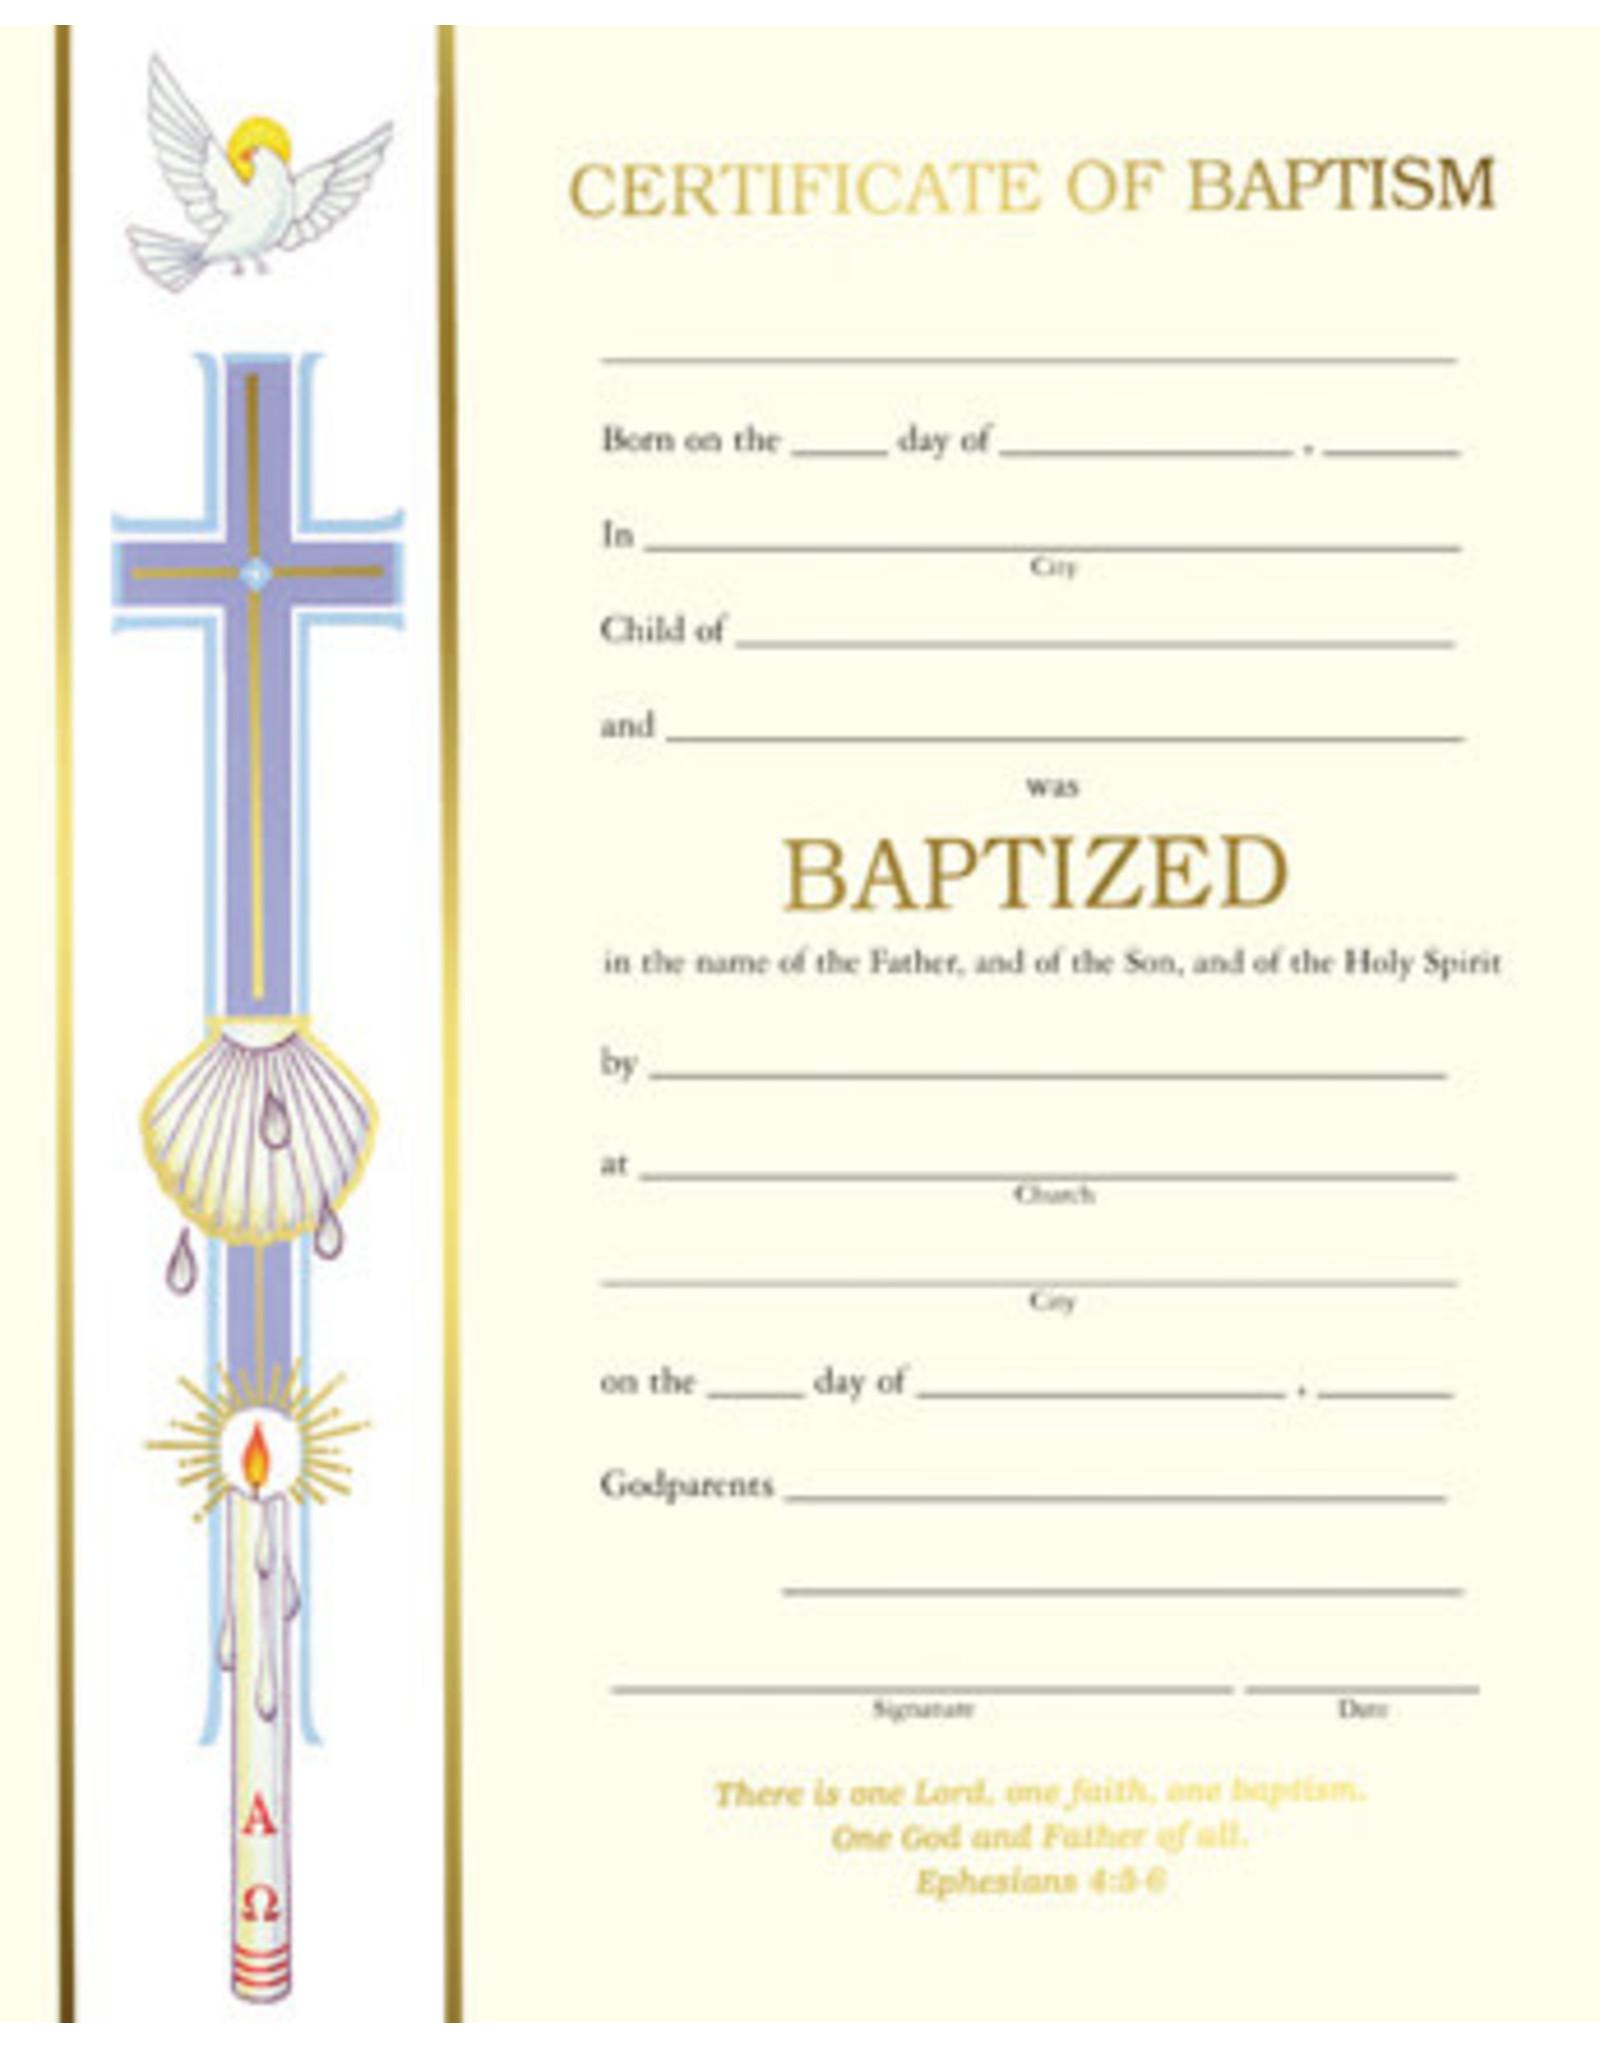 Baptism Certificate Non-Denominational (Each)